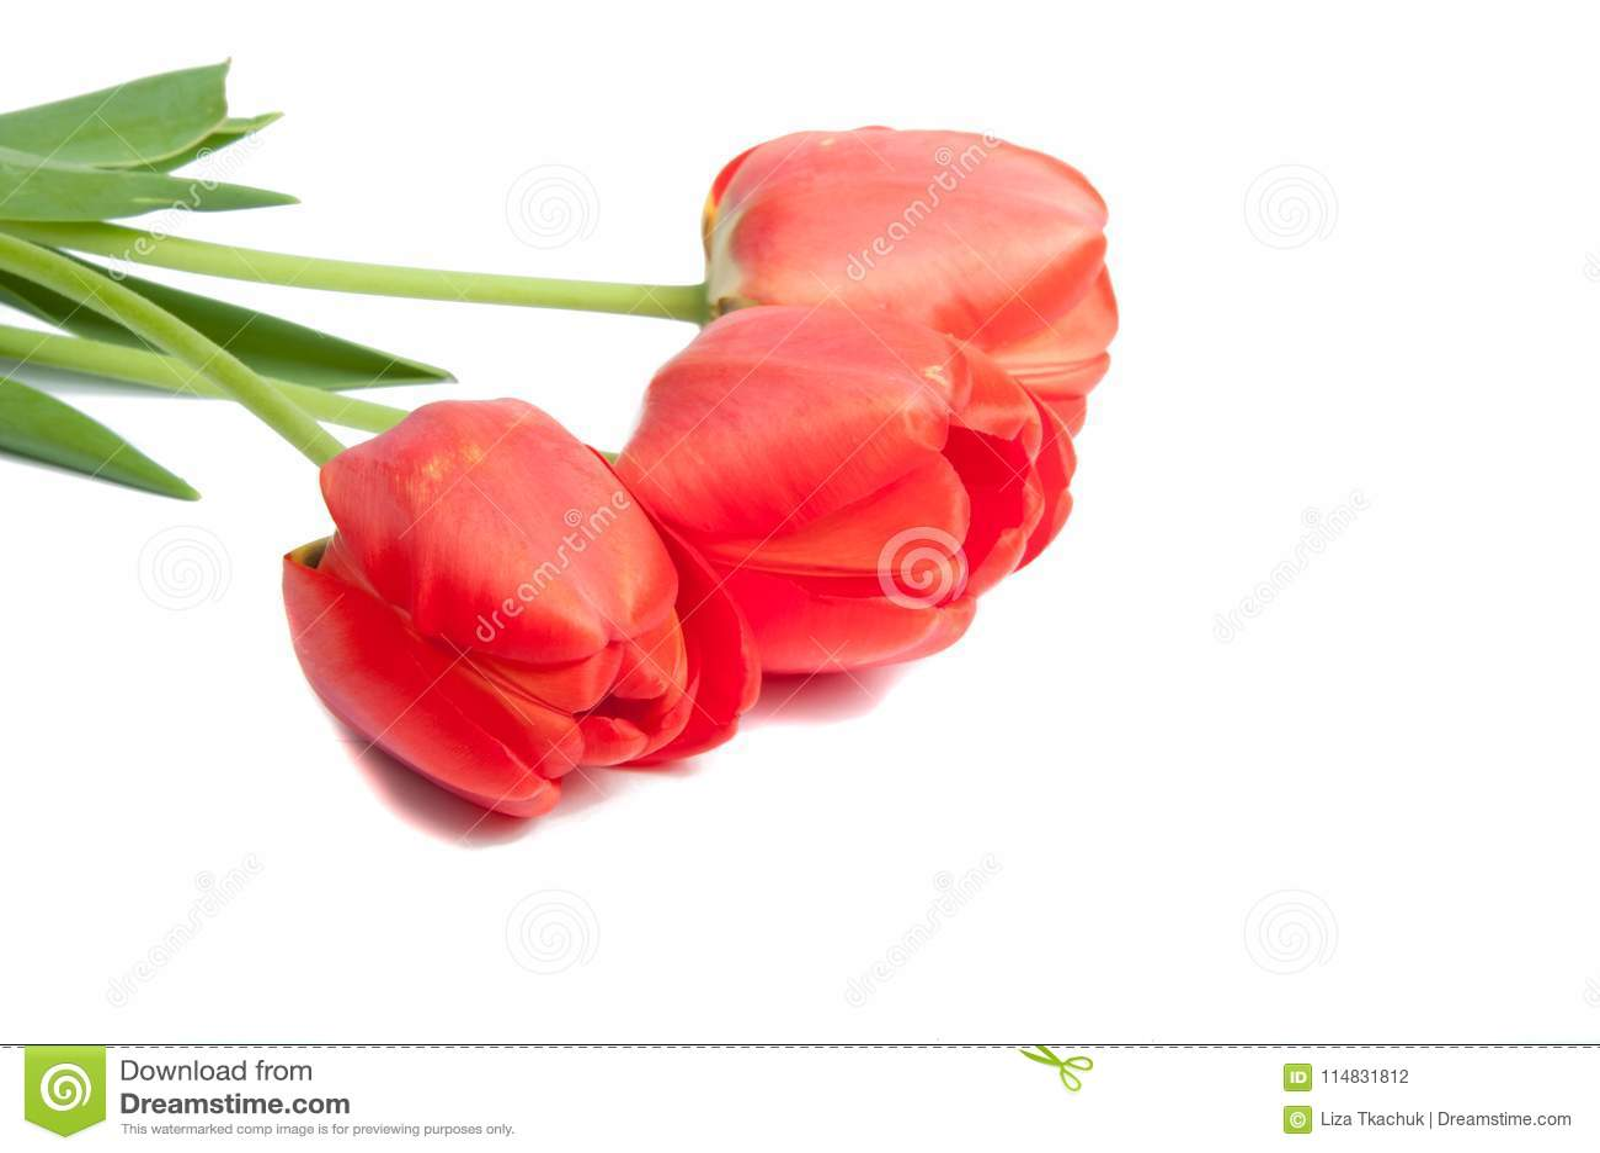 Red tulip beauty flower stock photo image of tulip 114831812 download red tulip beauty flower stock photo image of tulip 114831812 izmirmasajfo